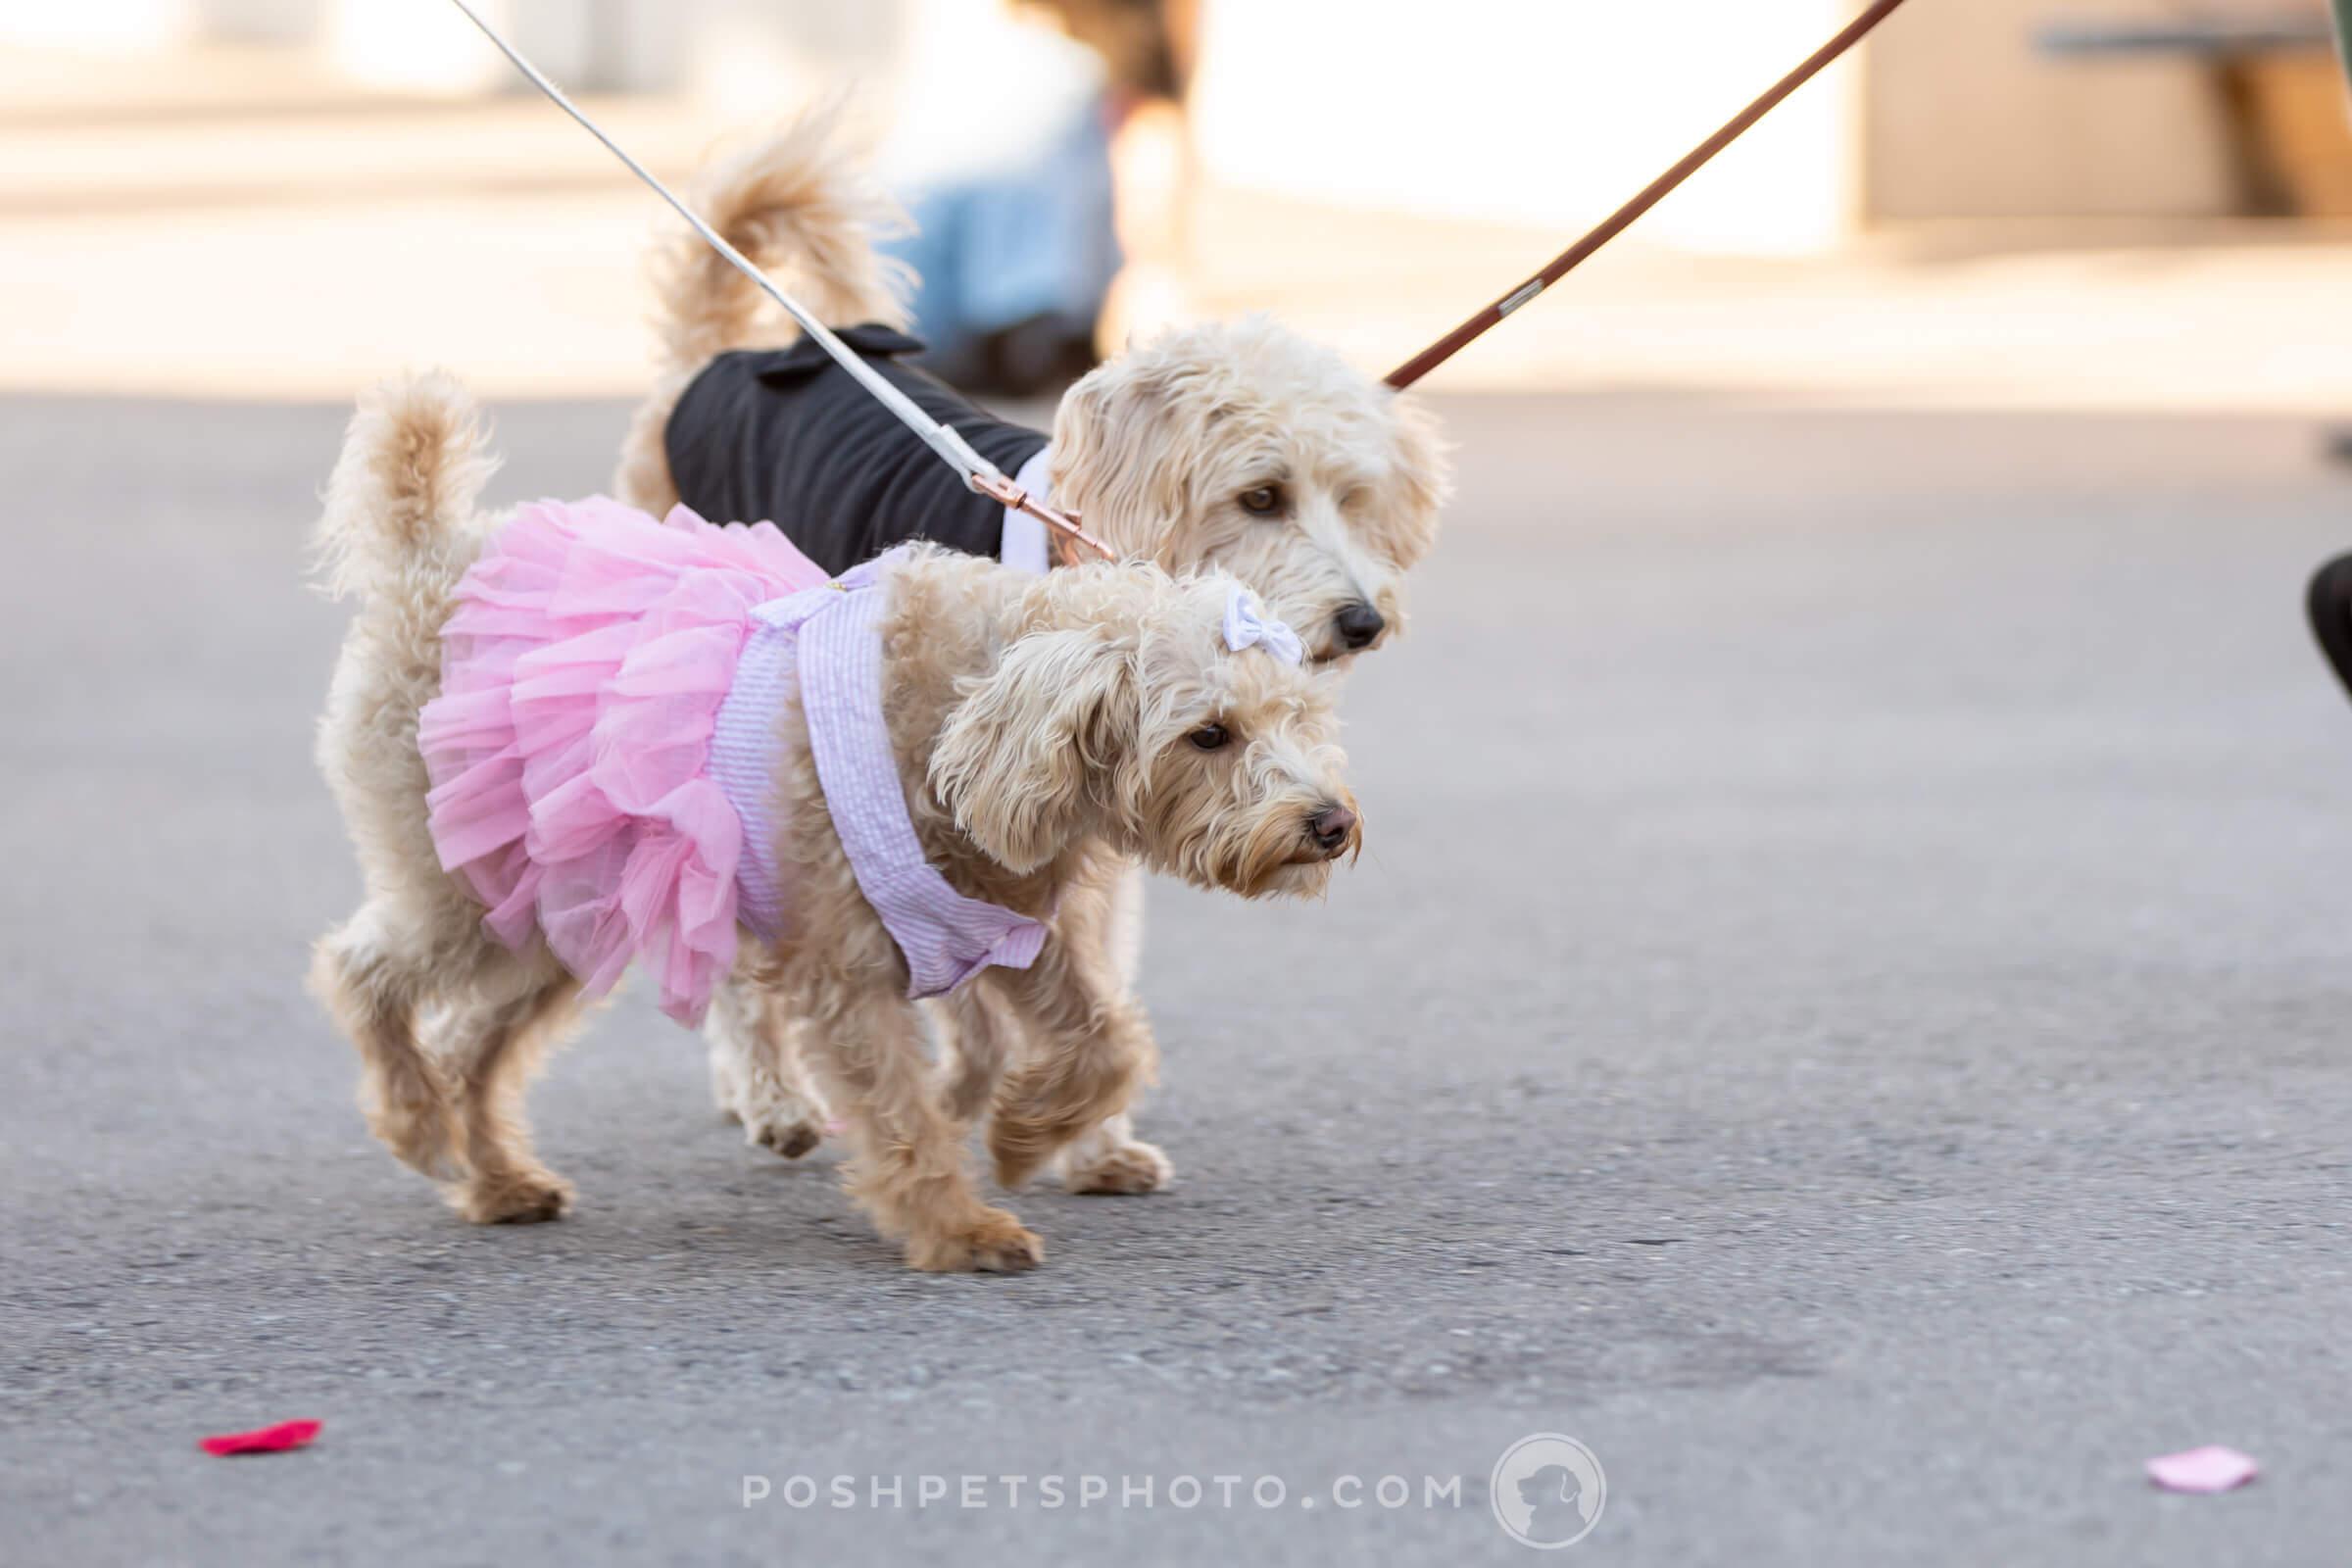 posh-pets-photography-26